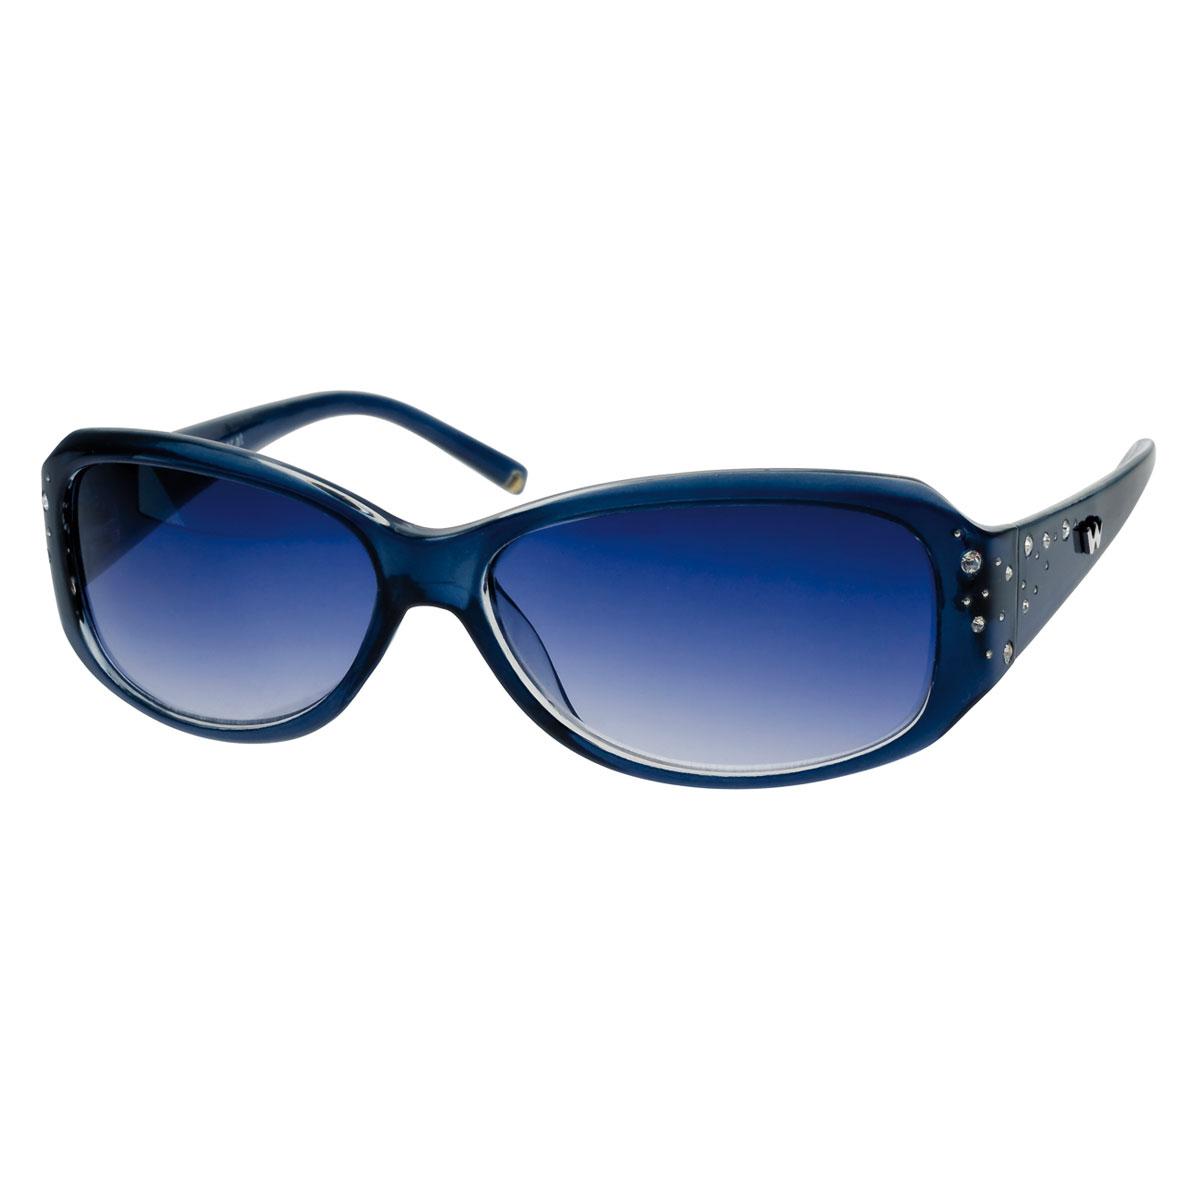 عینک آبی مدل نیوجرسی